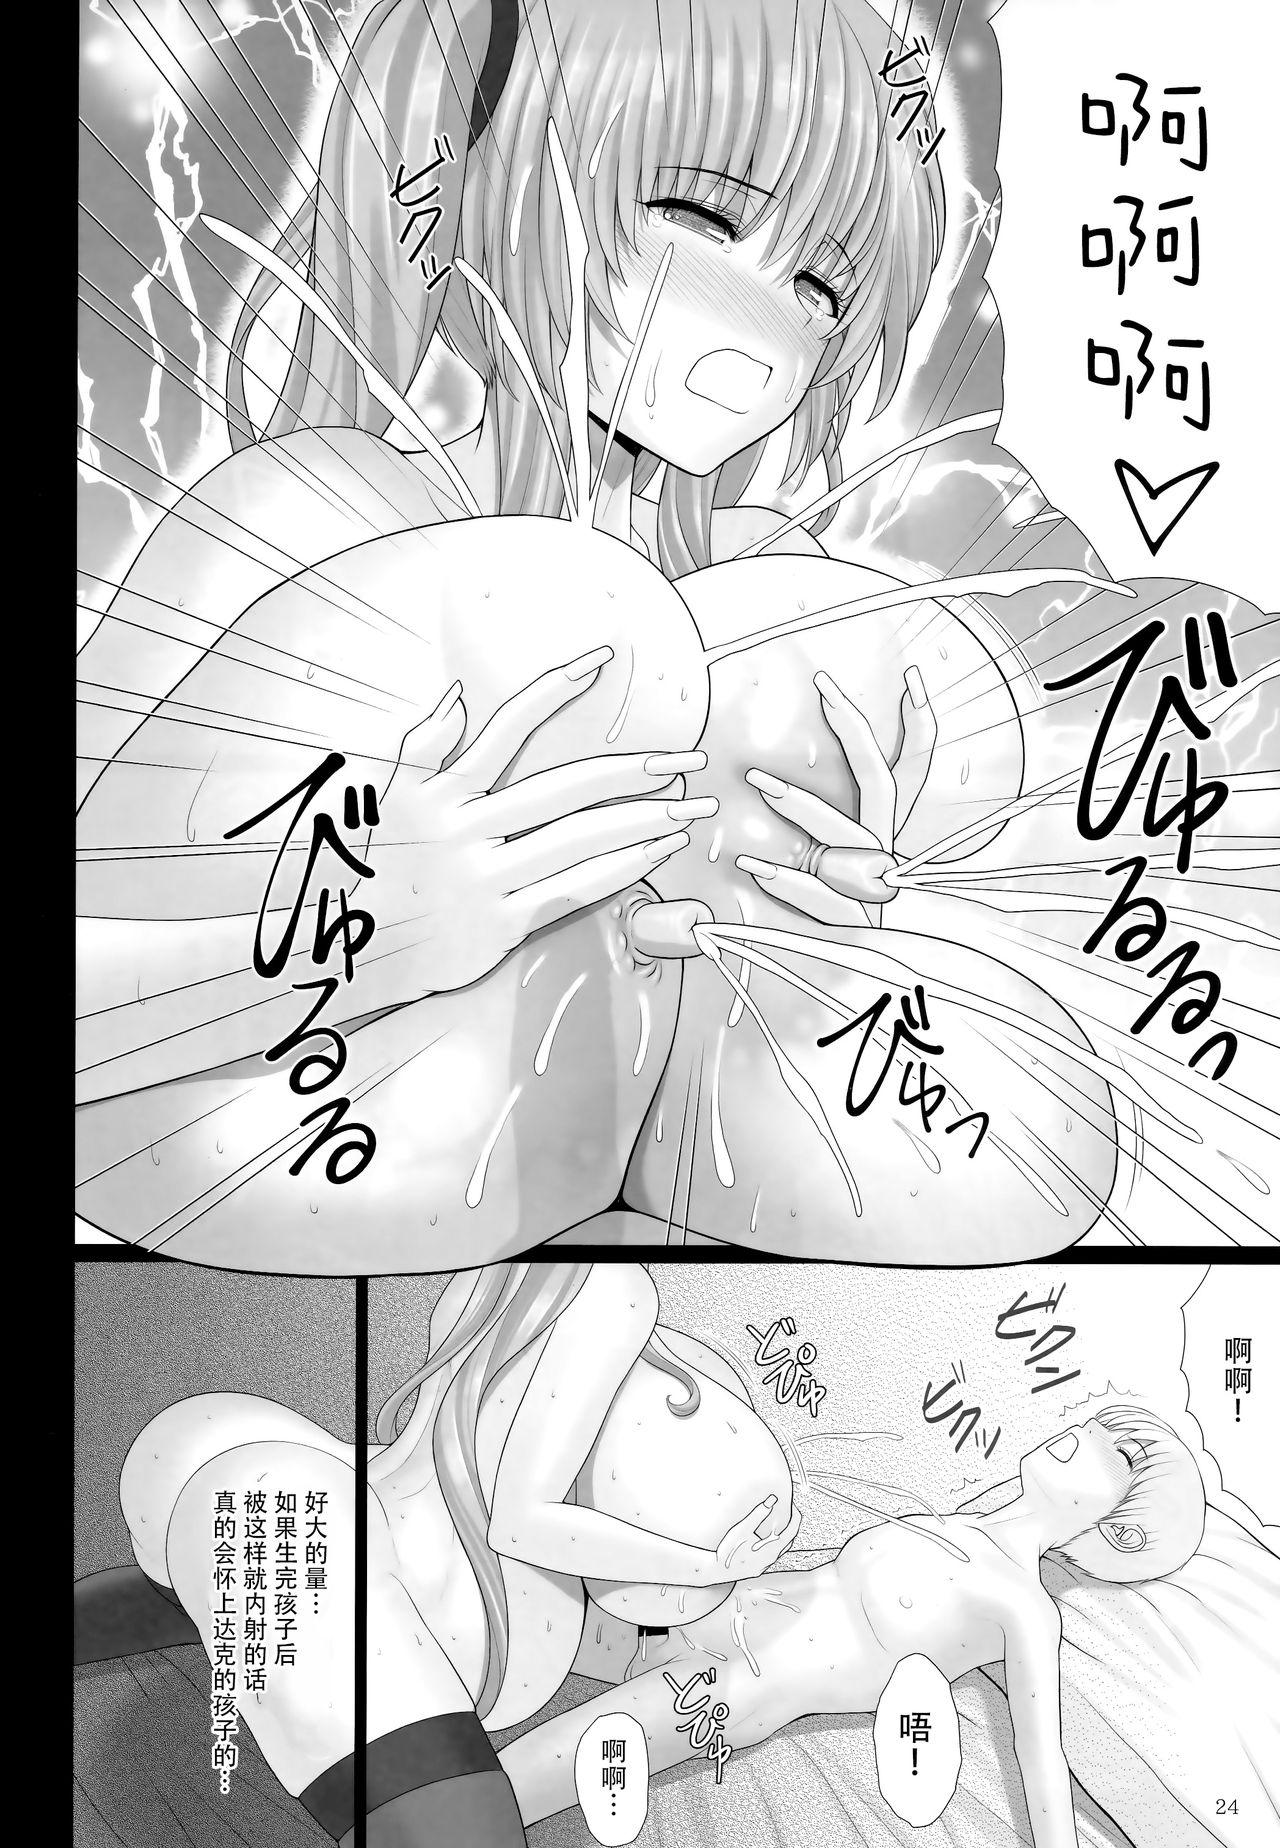 El toiu Shoujo no Monogatari X9 22